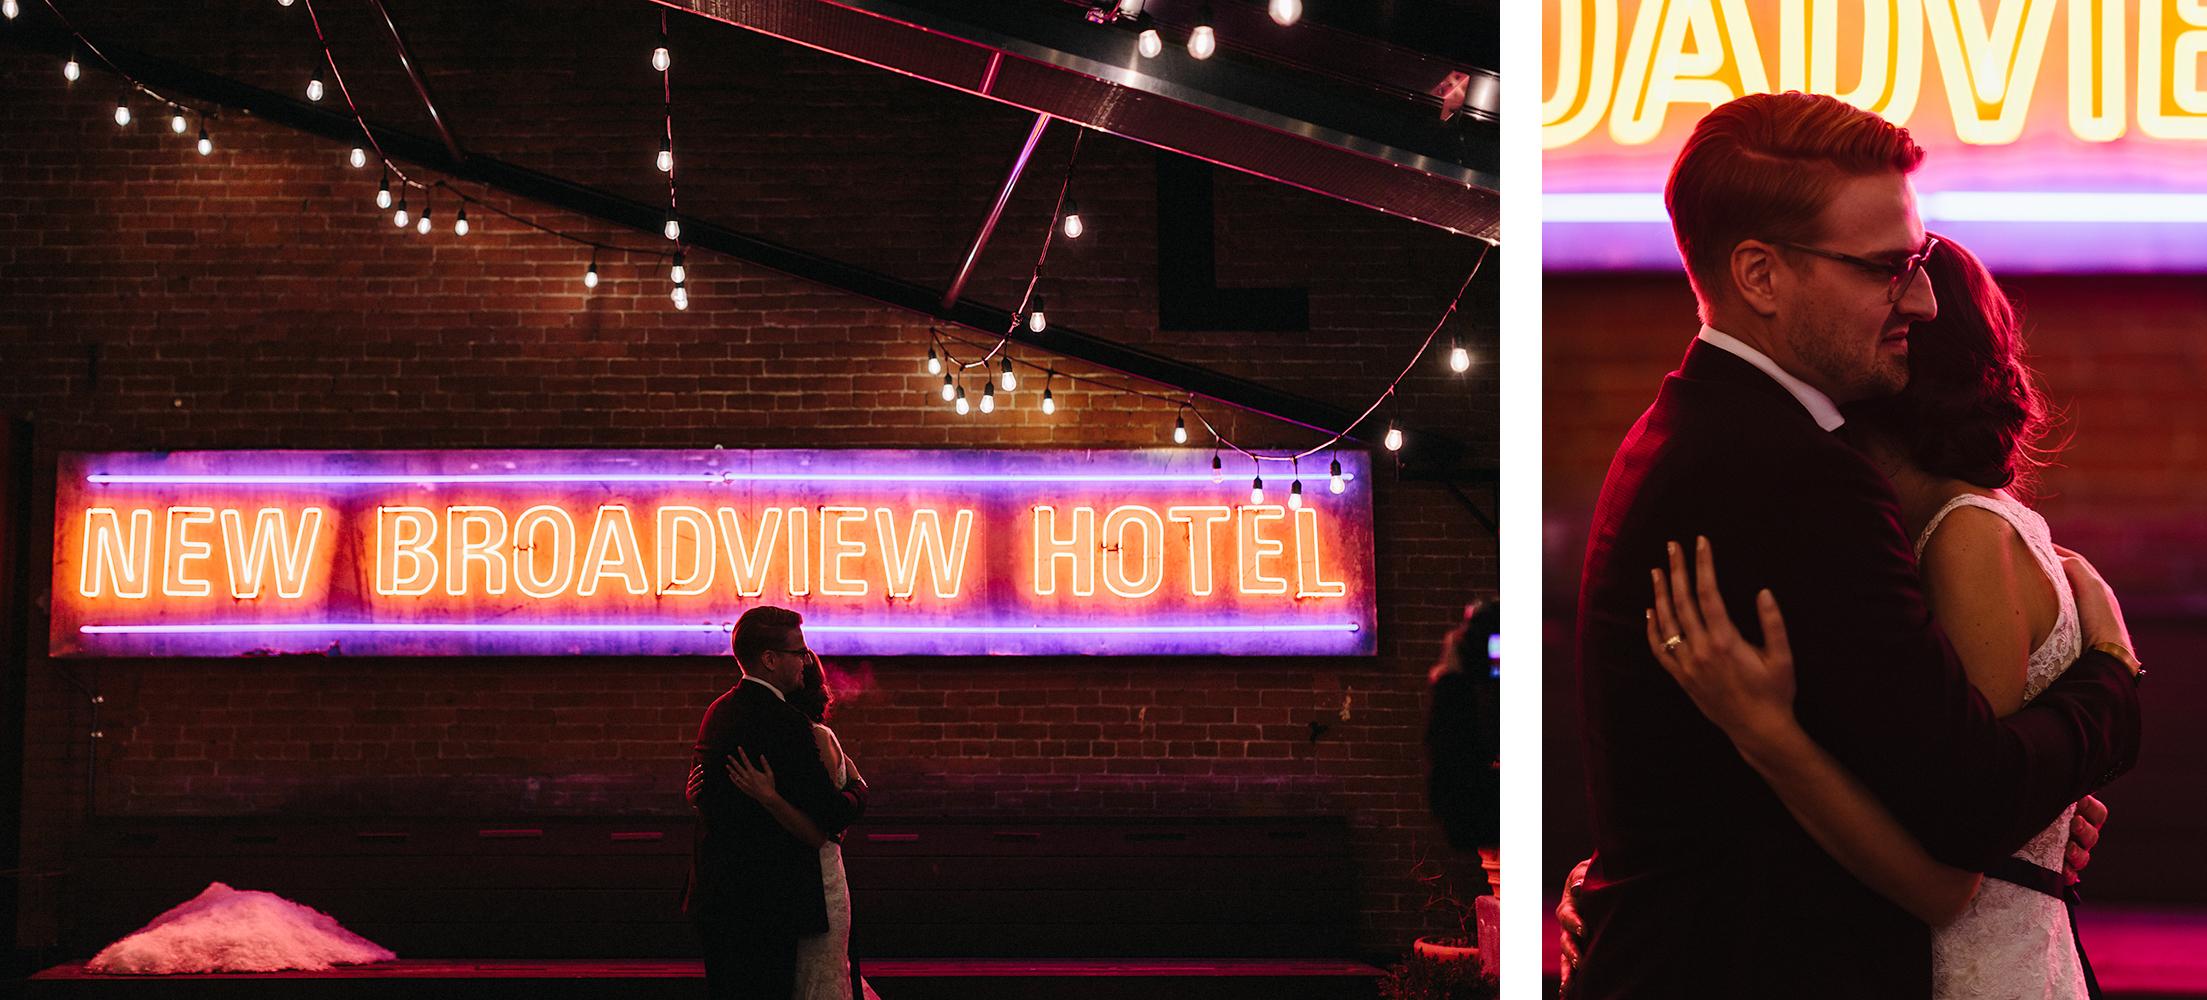 broadview-hotel-REAL-wedding-photos-best-wedding-venues-toronto-analog-film-wedding-photography-boutique-hotel-30.jpg